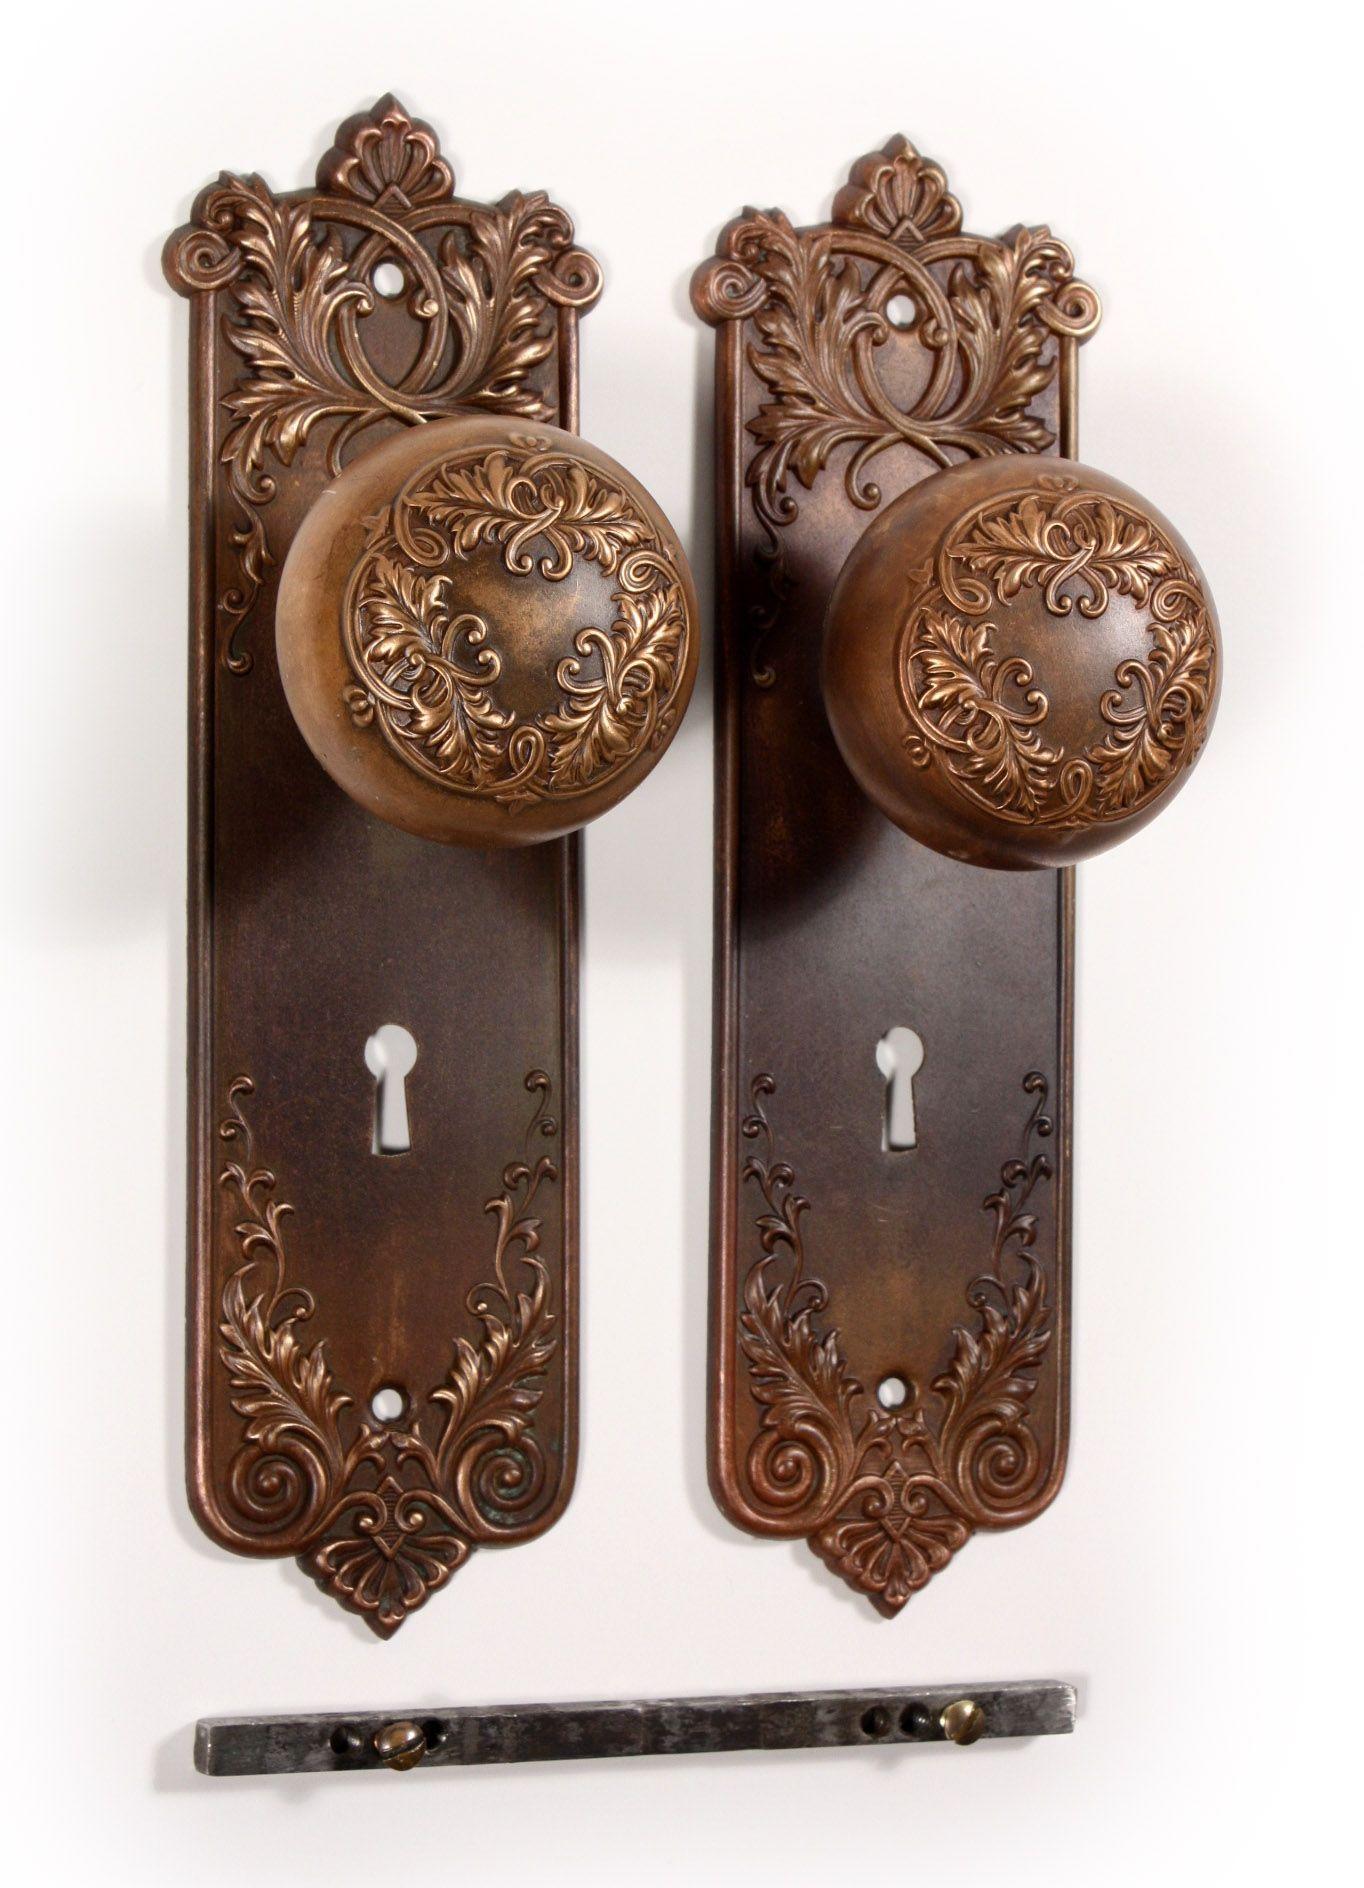 Vintage Door Knob Backplates Door Locks And Knobs For Measurements inside  size 1364 X 1888 - Antique Door Knob Backplates • Knobs Ideas Site